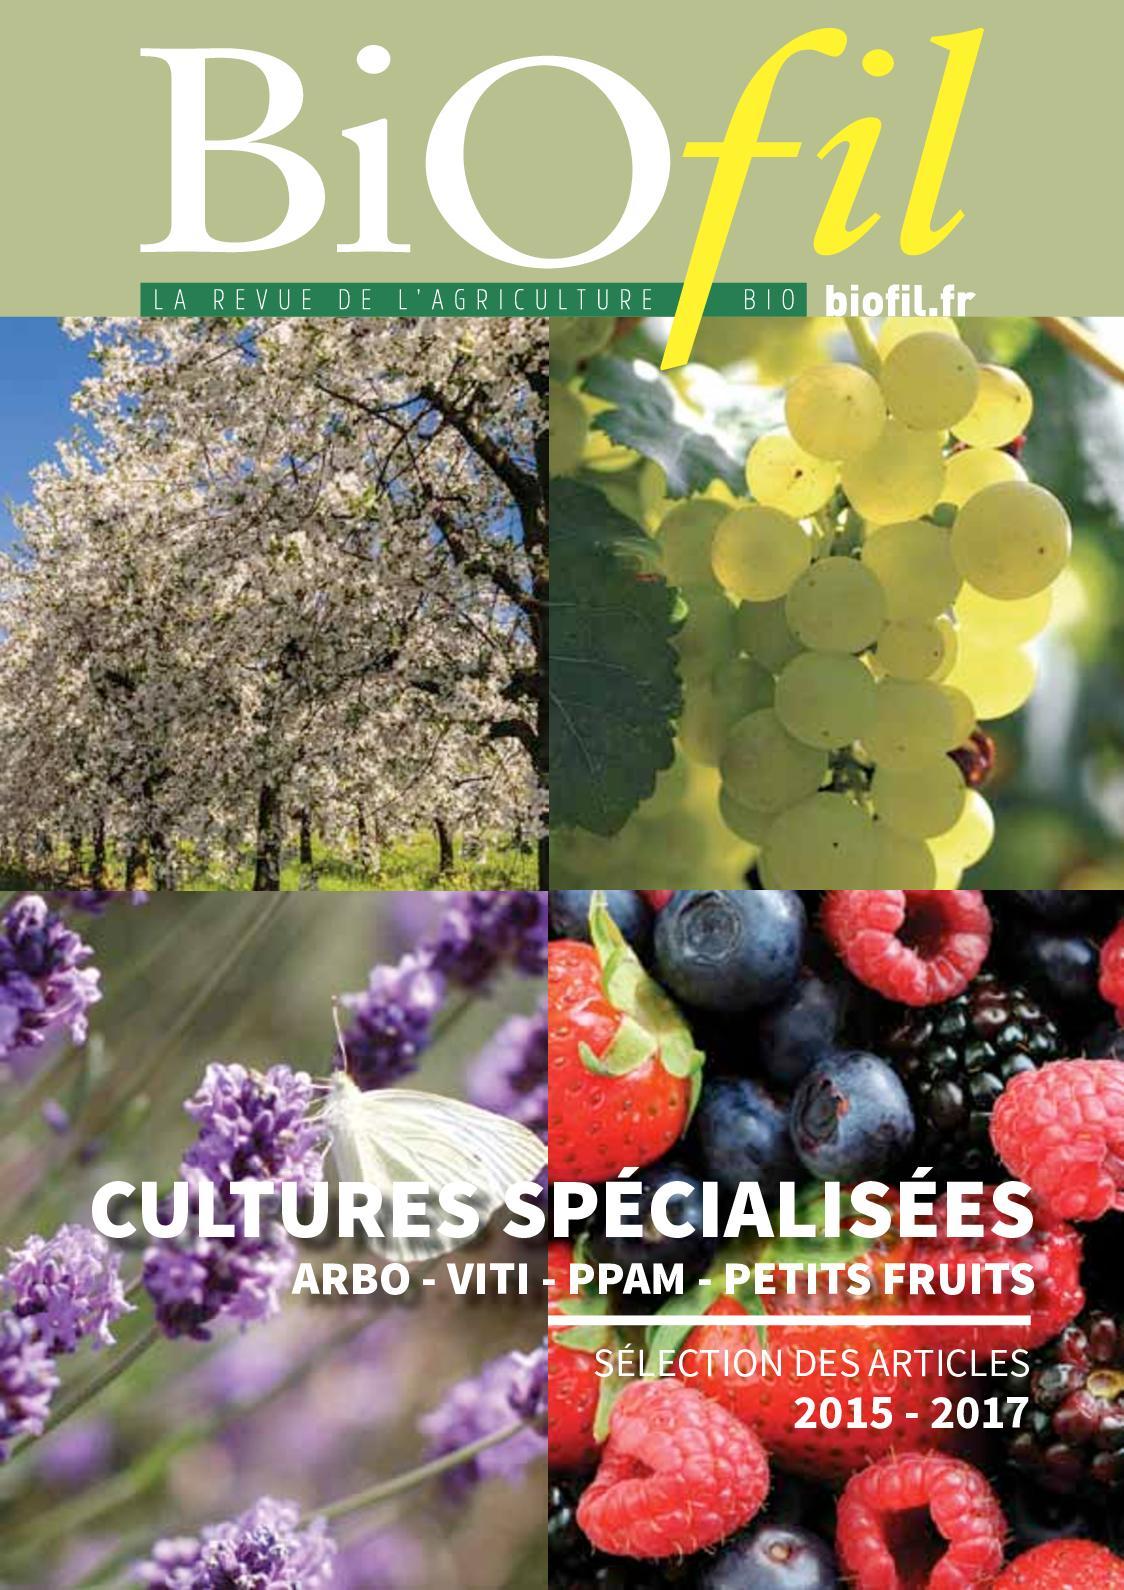 recueil cultures specialisees biofil